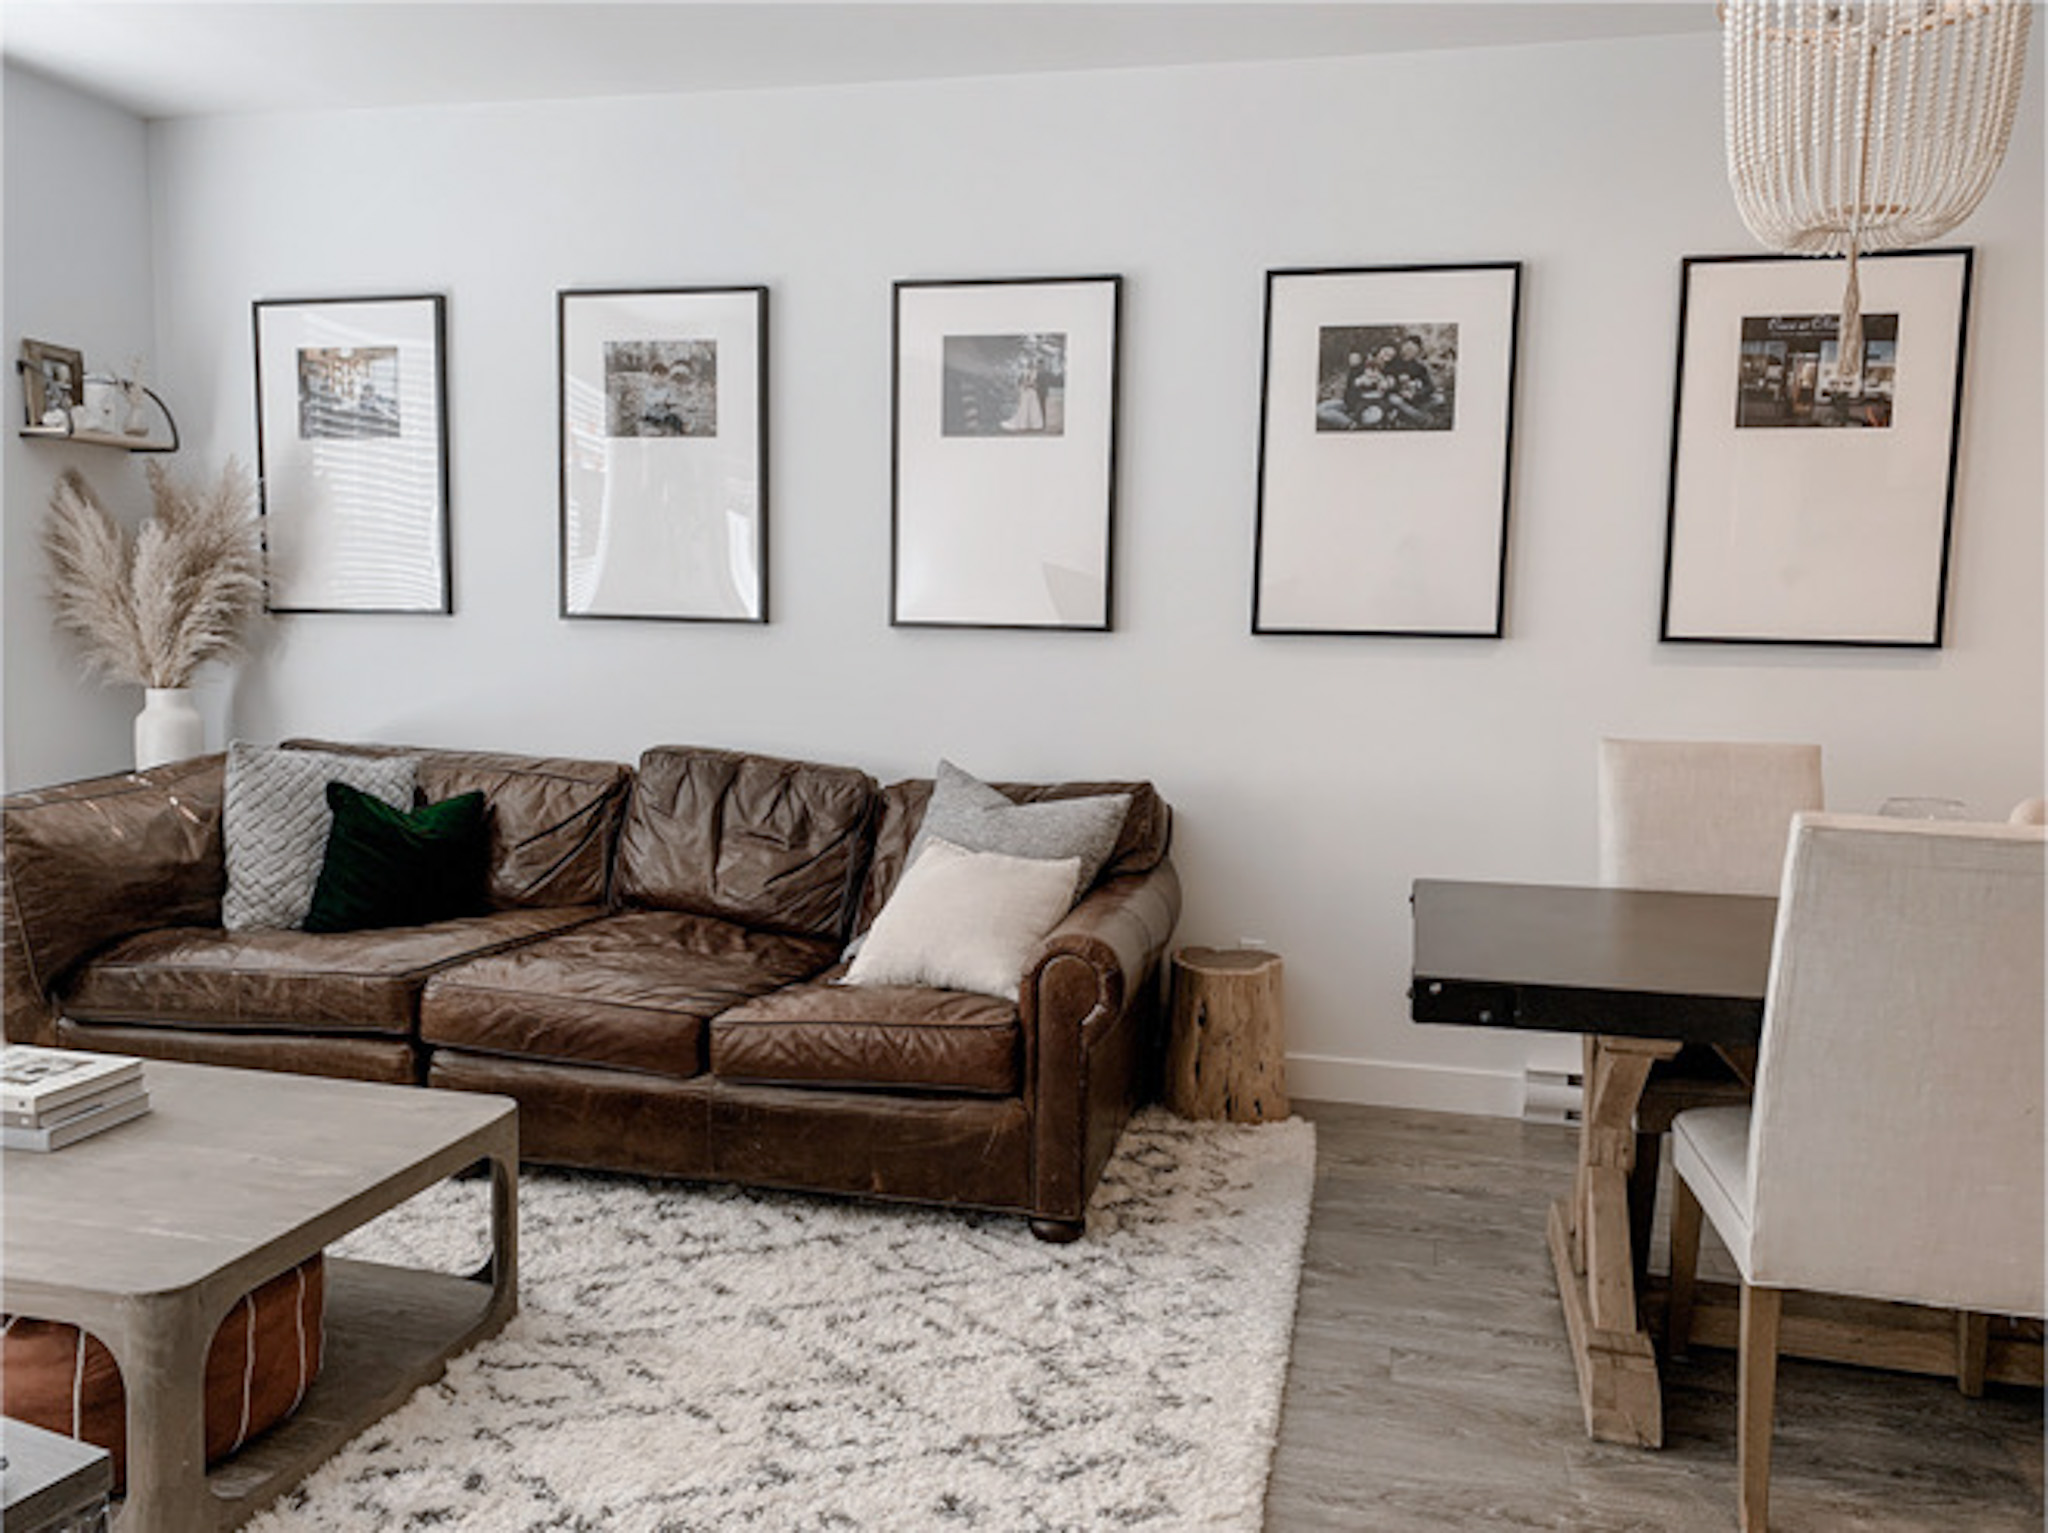 This oversized mat frame DIY looks so easy! I'm also loving the minimalist, natural home decor. #homedecor #decordiy #diy